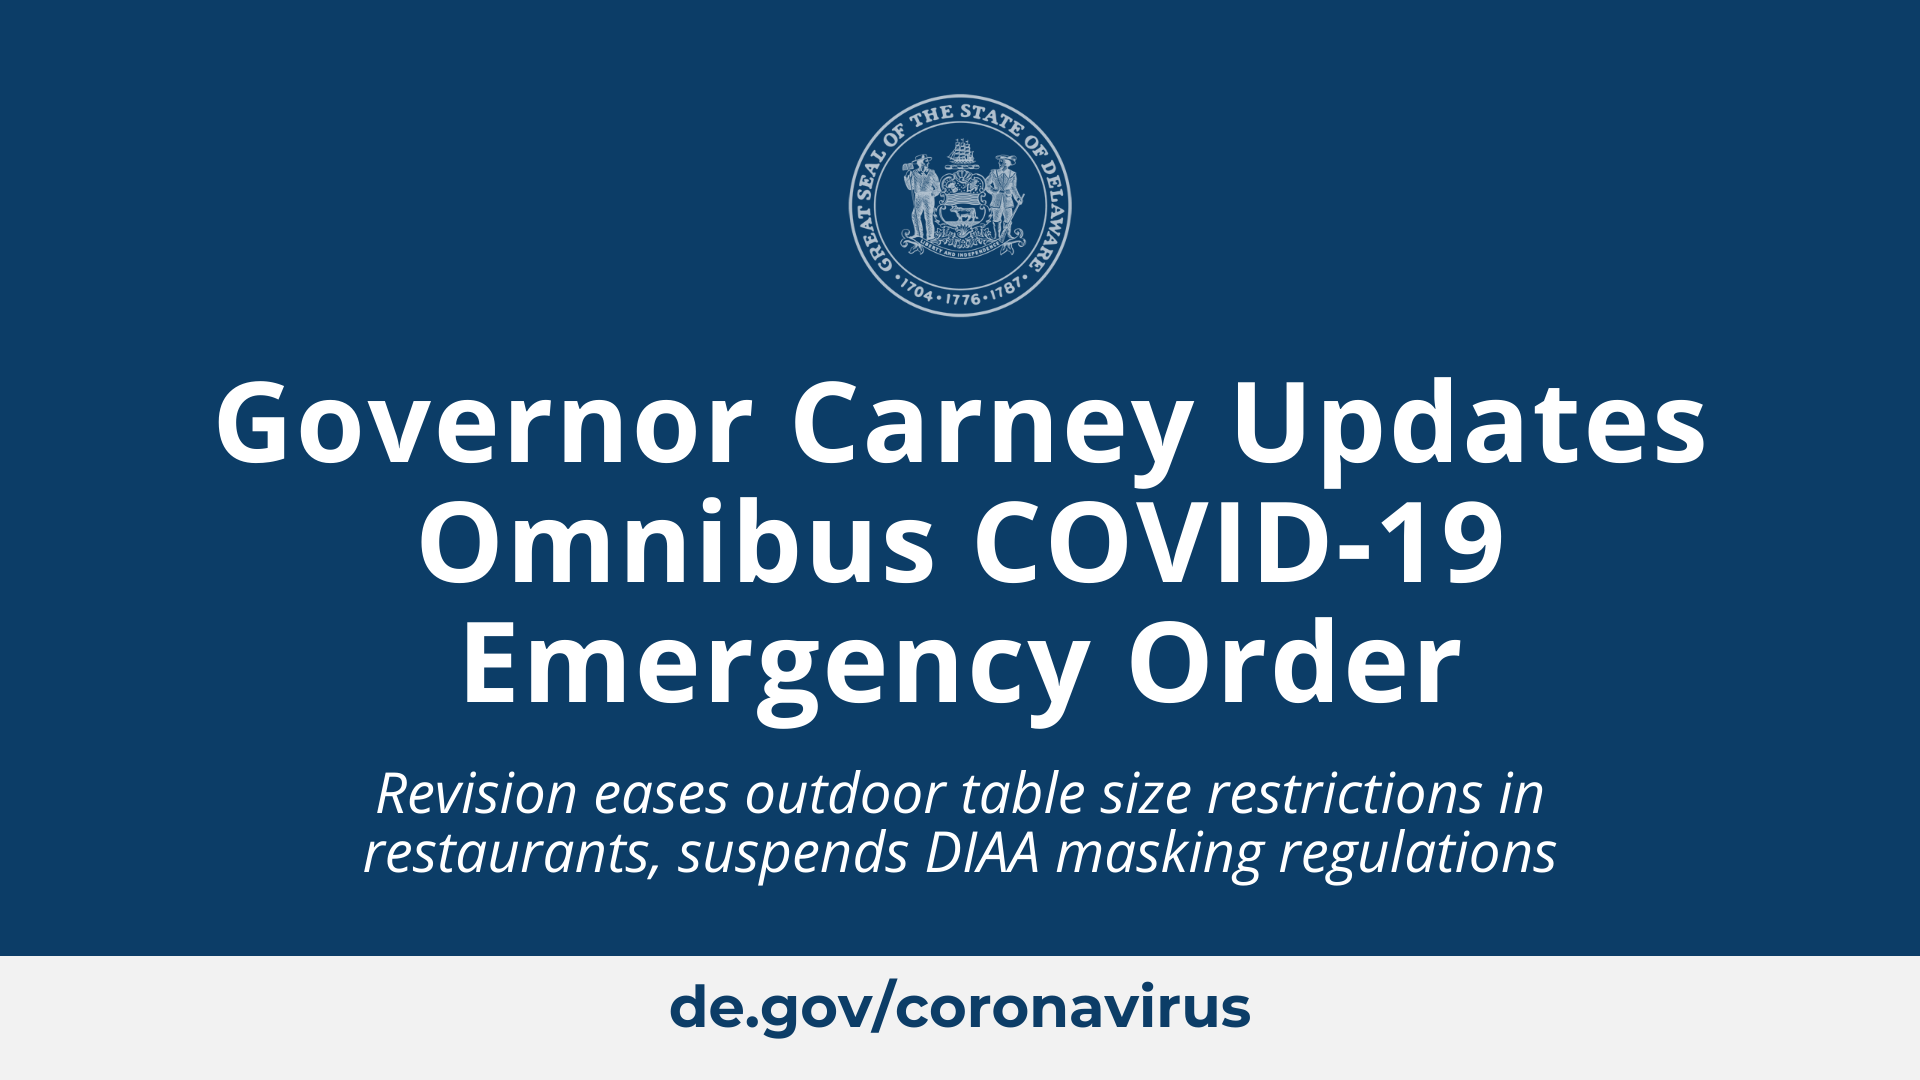 Governor Carney Updates Omnibus COVID-19 Emergency Order